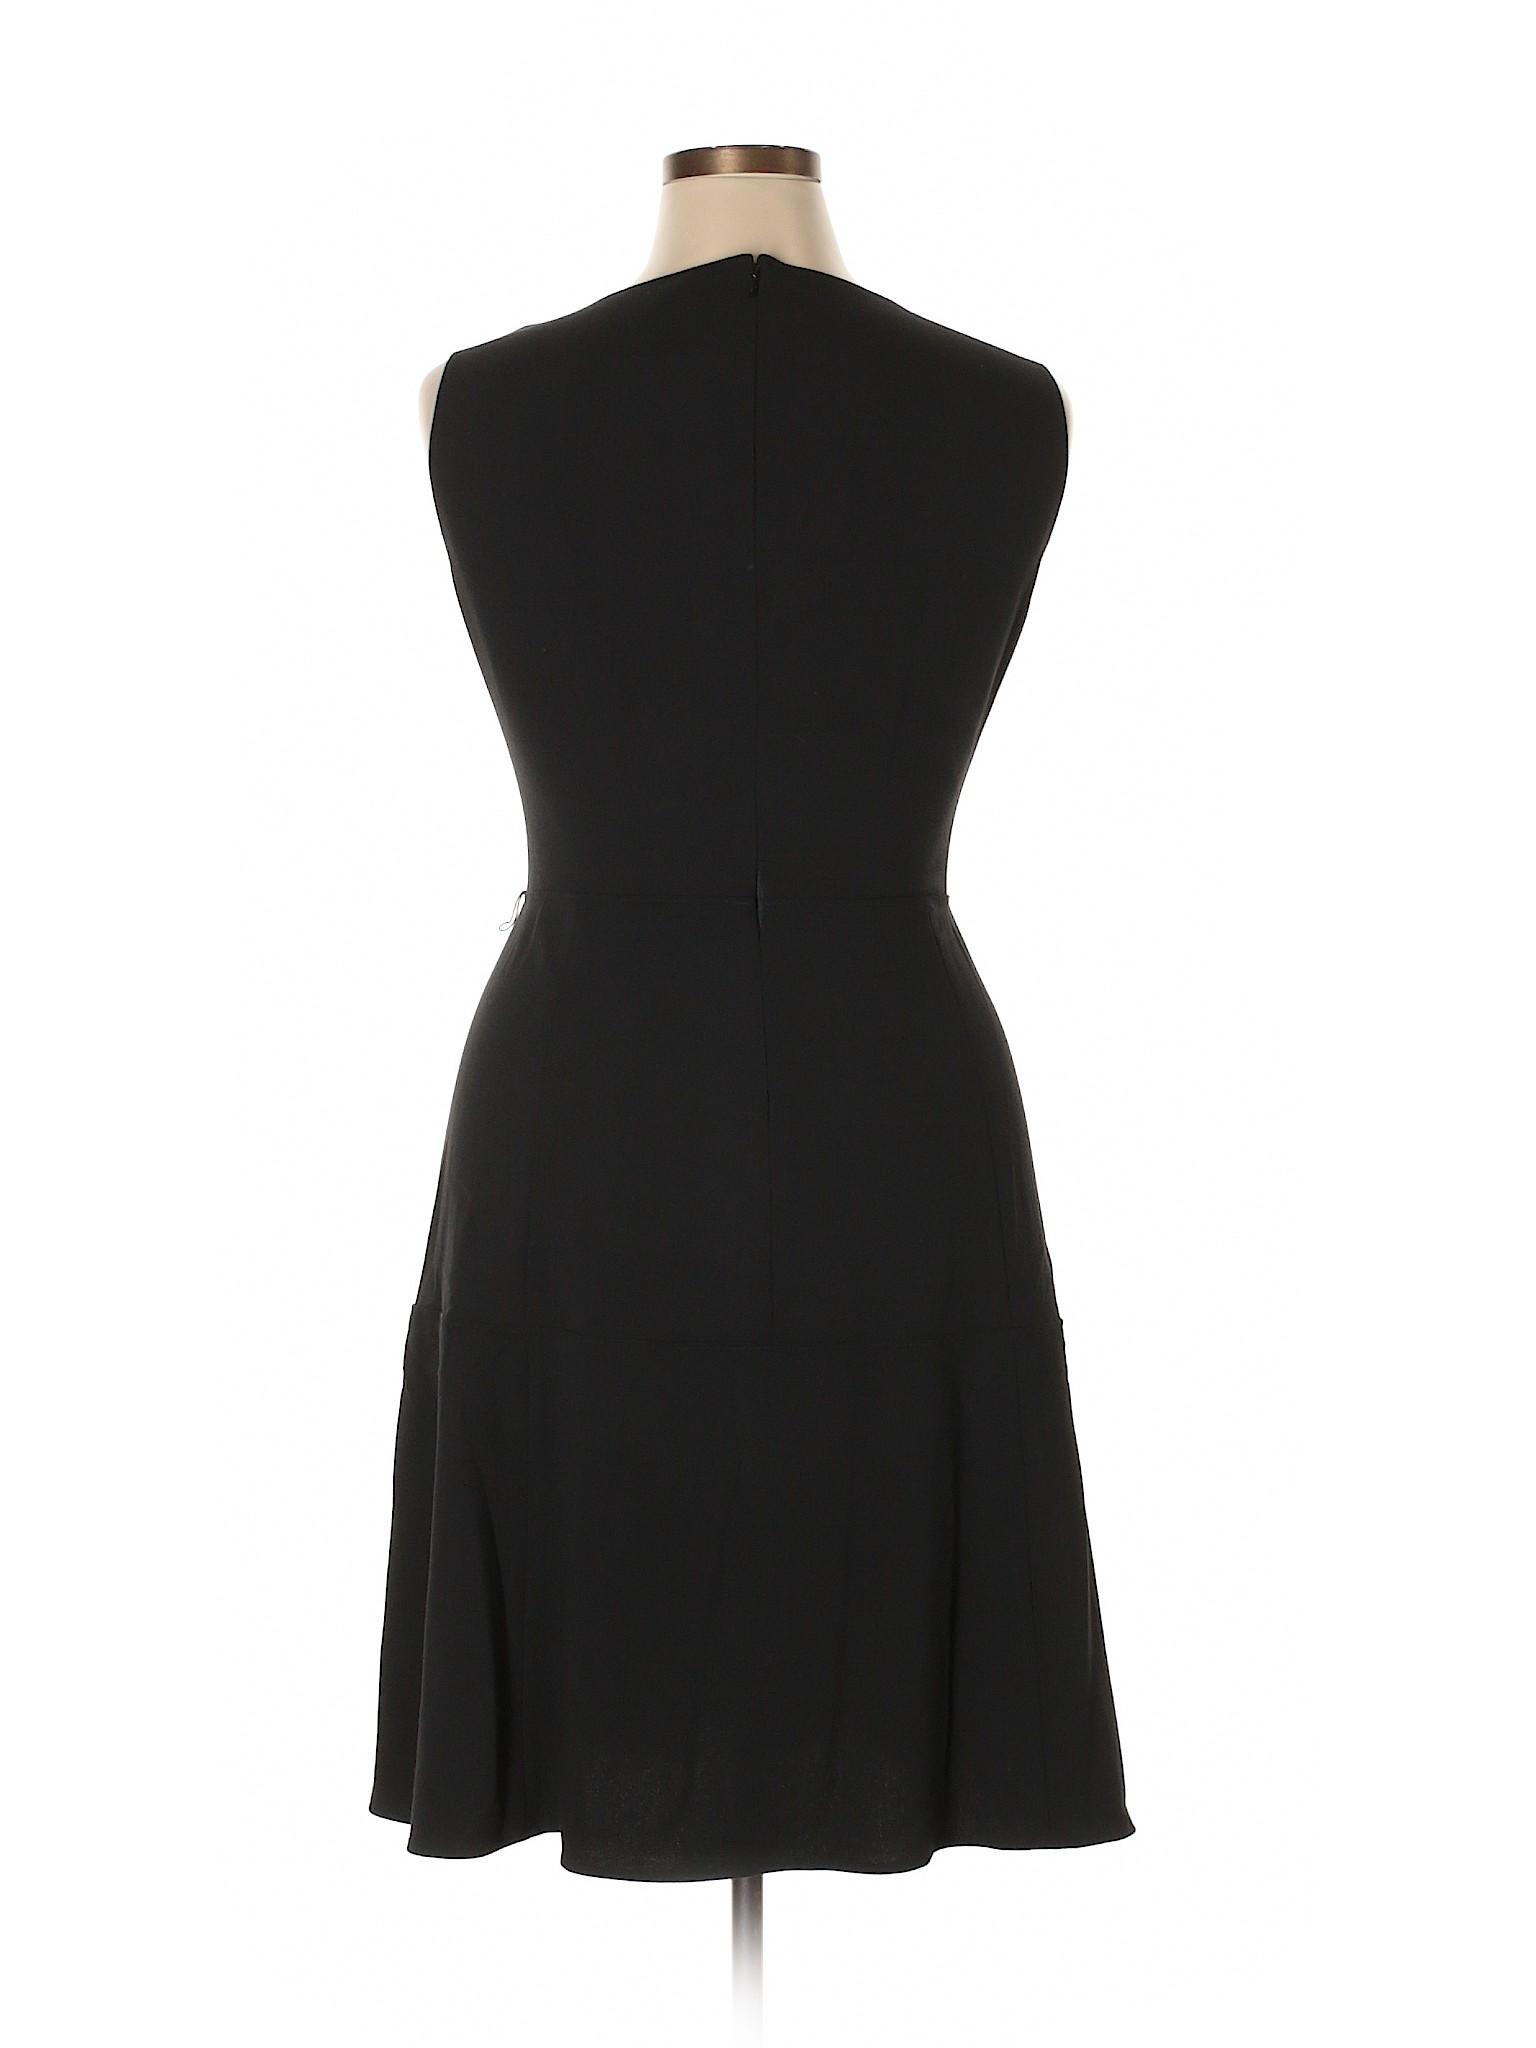 Casual Dress Calvin winter Klein Boutique qwSRtxaZ